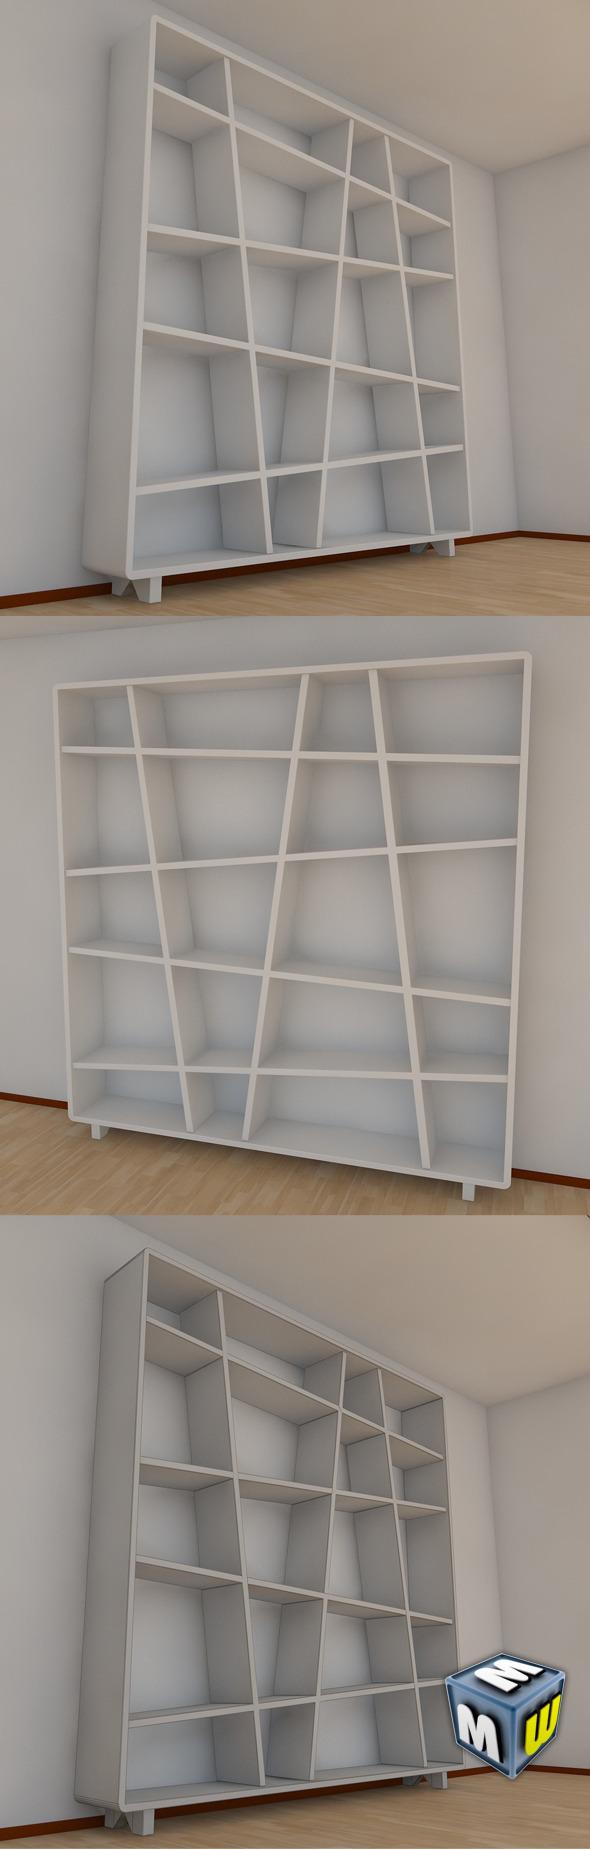 3DOcean Bookshelf 10 MAX 2011 5004326